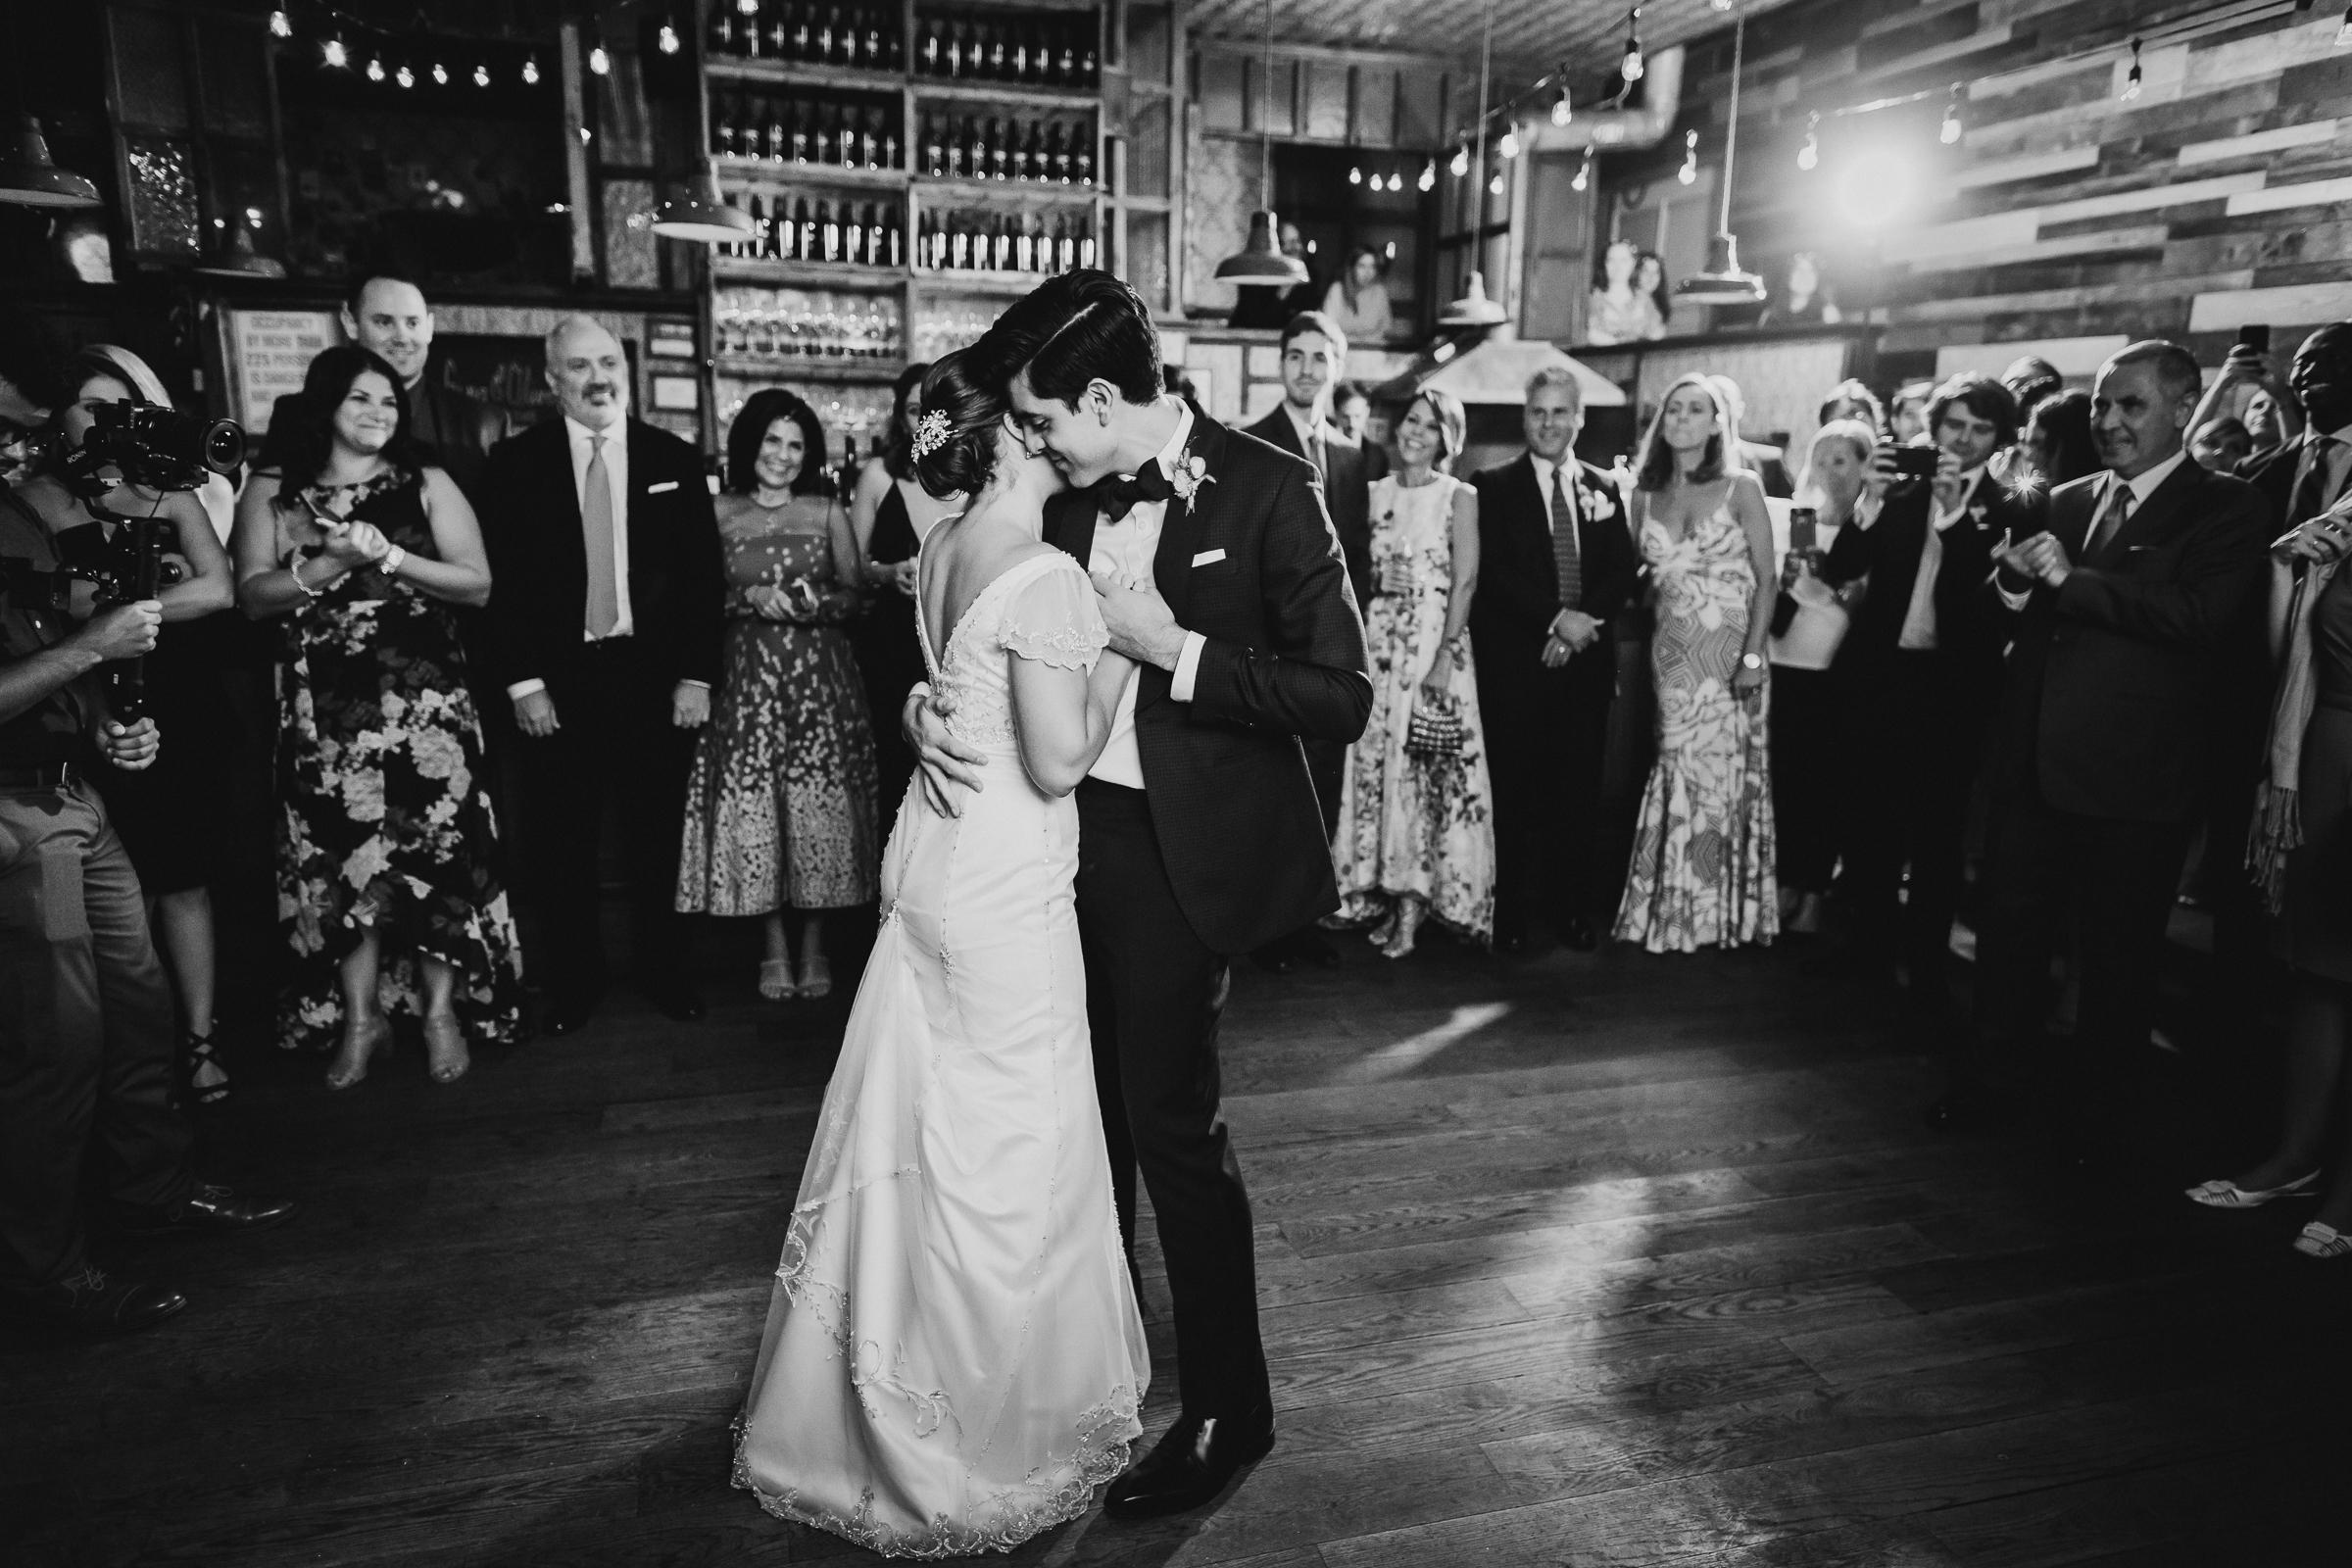 Brooklyn-Winery-NYC-Editorial-Documentary-Wedding-Photographer-Gina-Oli-99.jpg